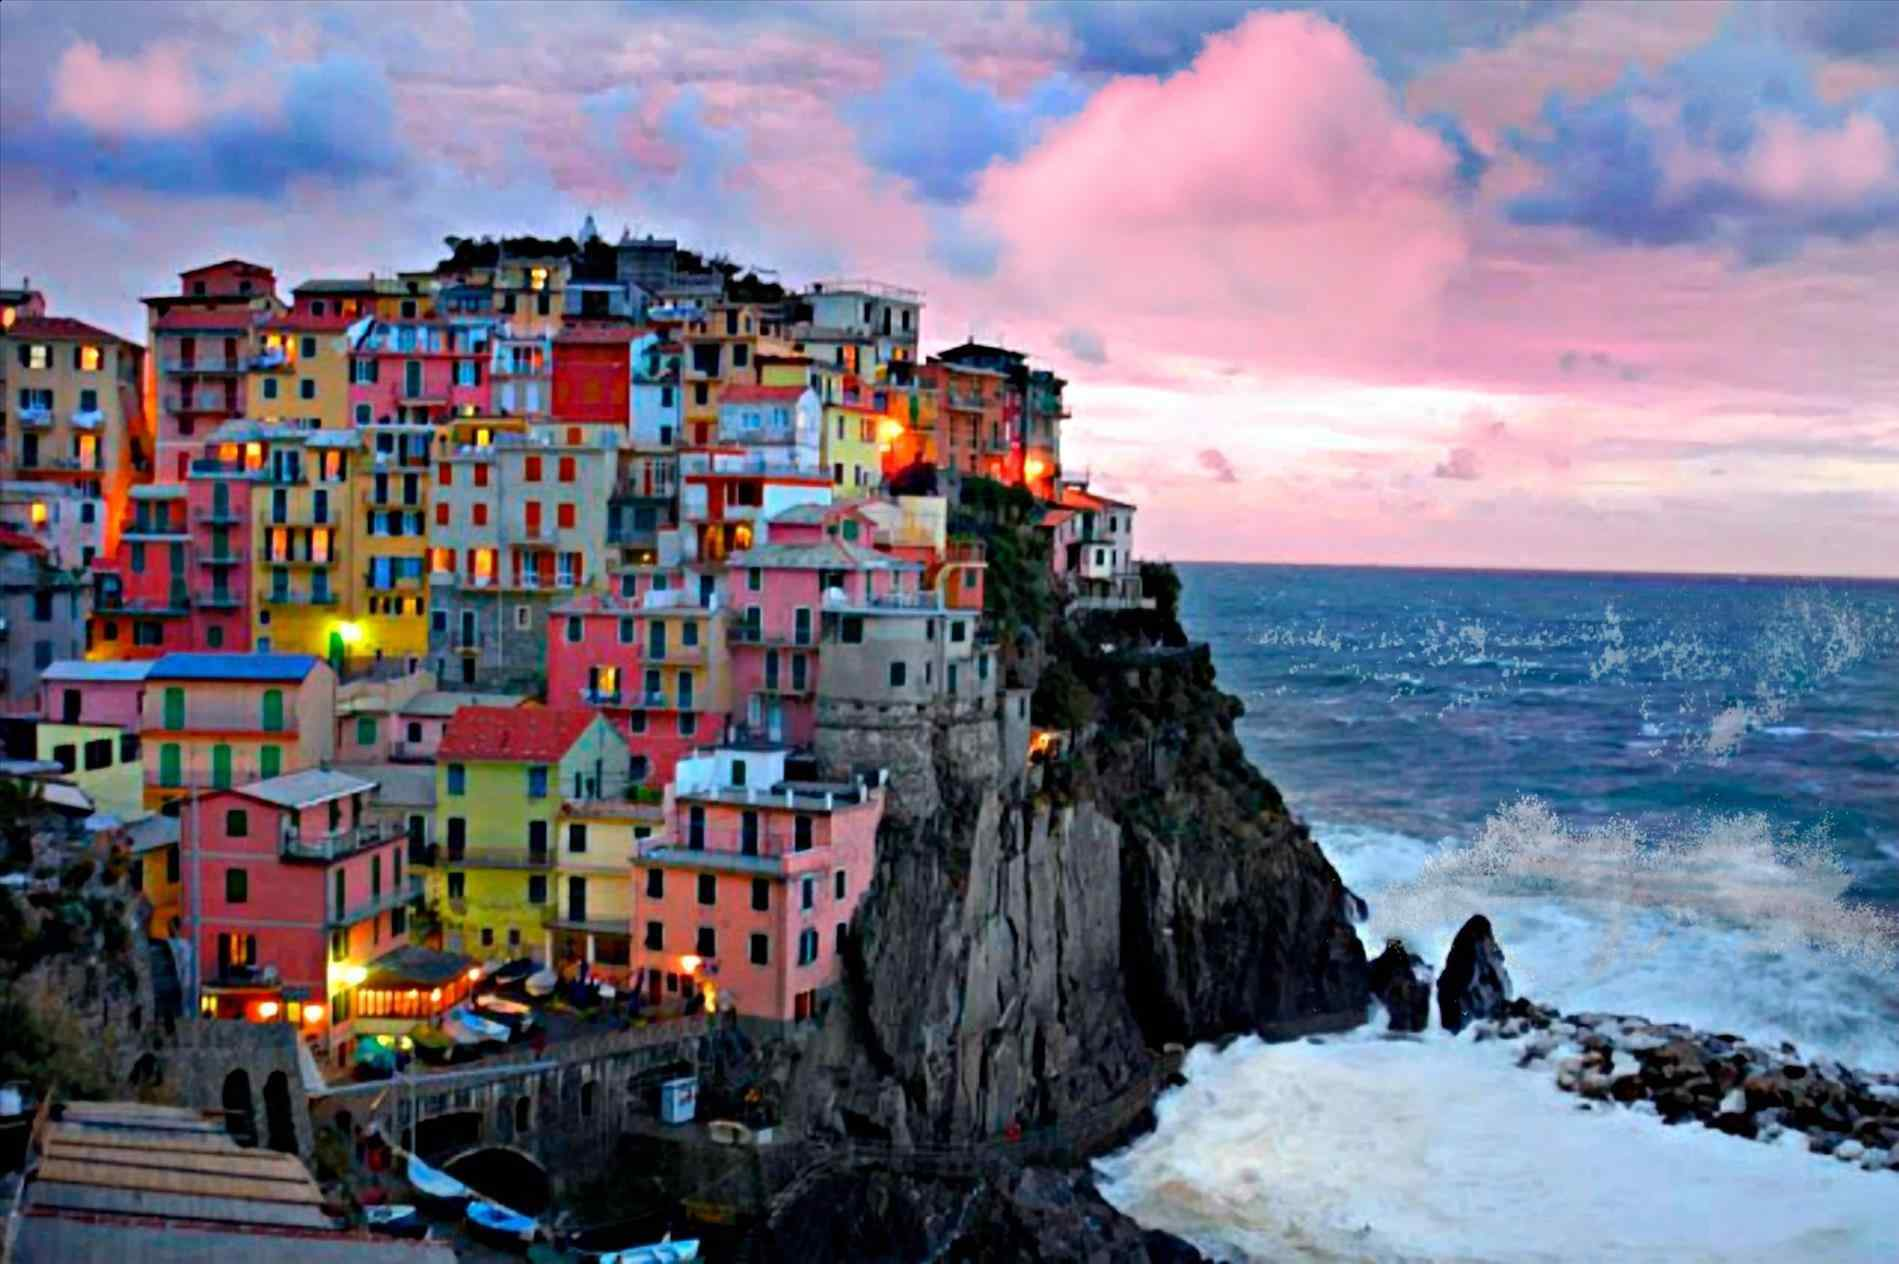 Italian Desktop Wallpapers Top Free Italian Desktop